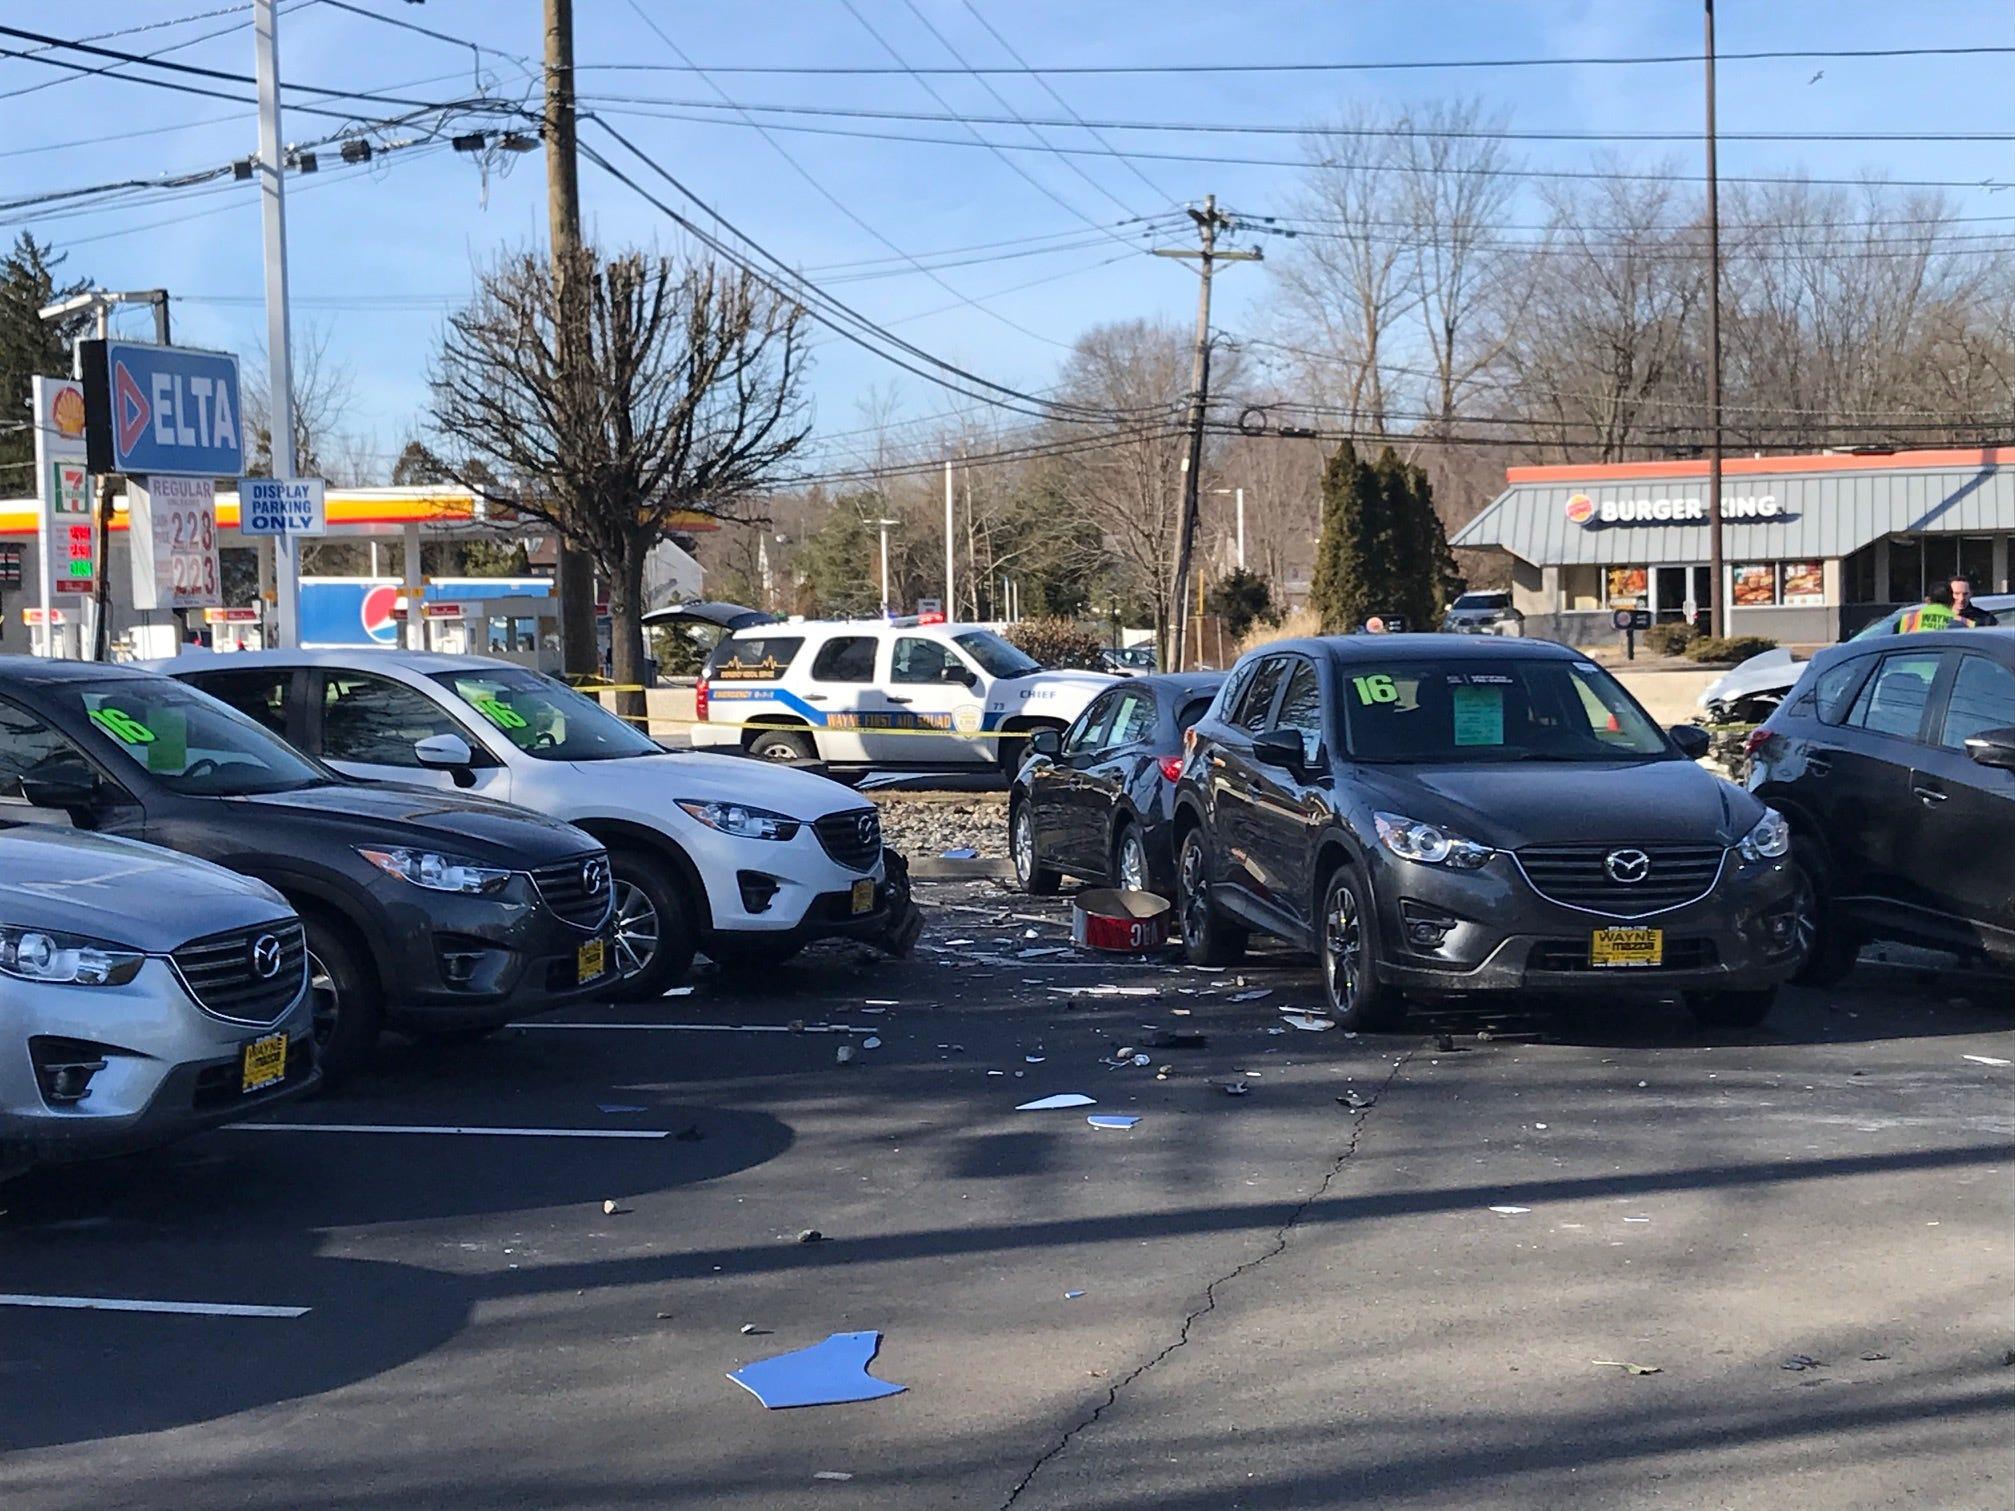 Several cars at Wayne Mazda were damaged by flying debris.